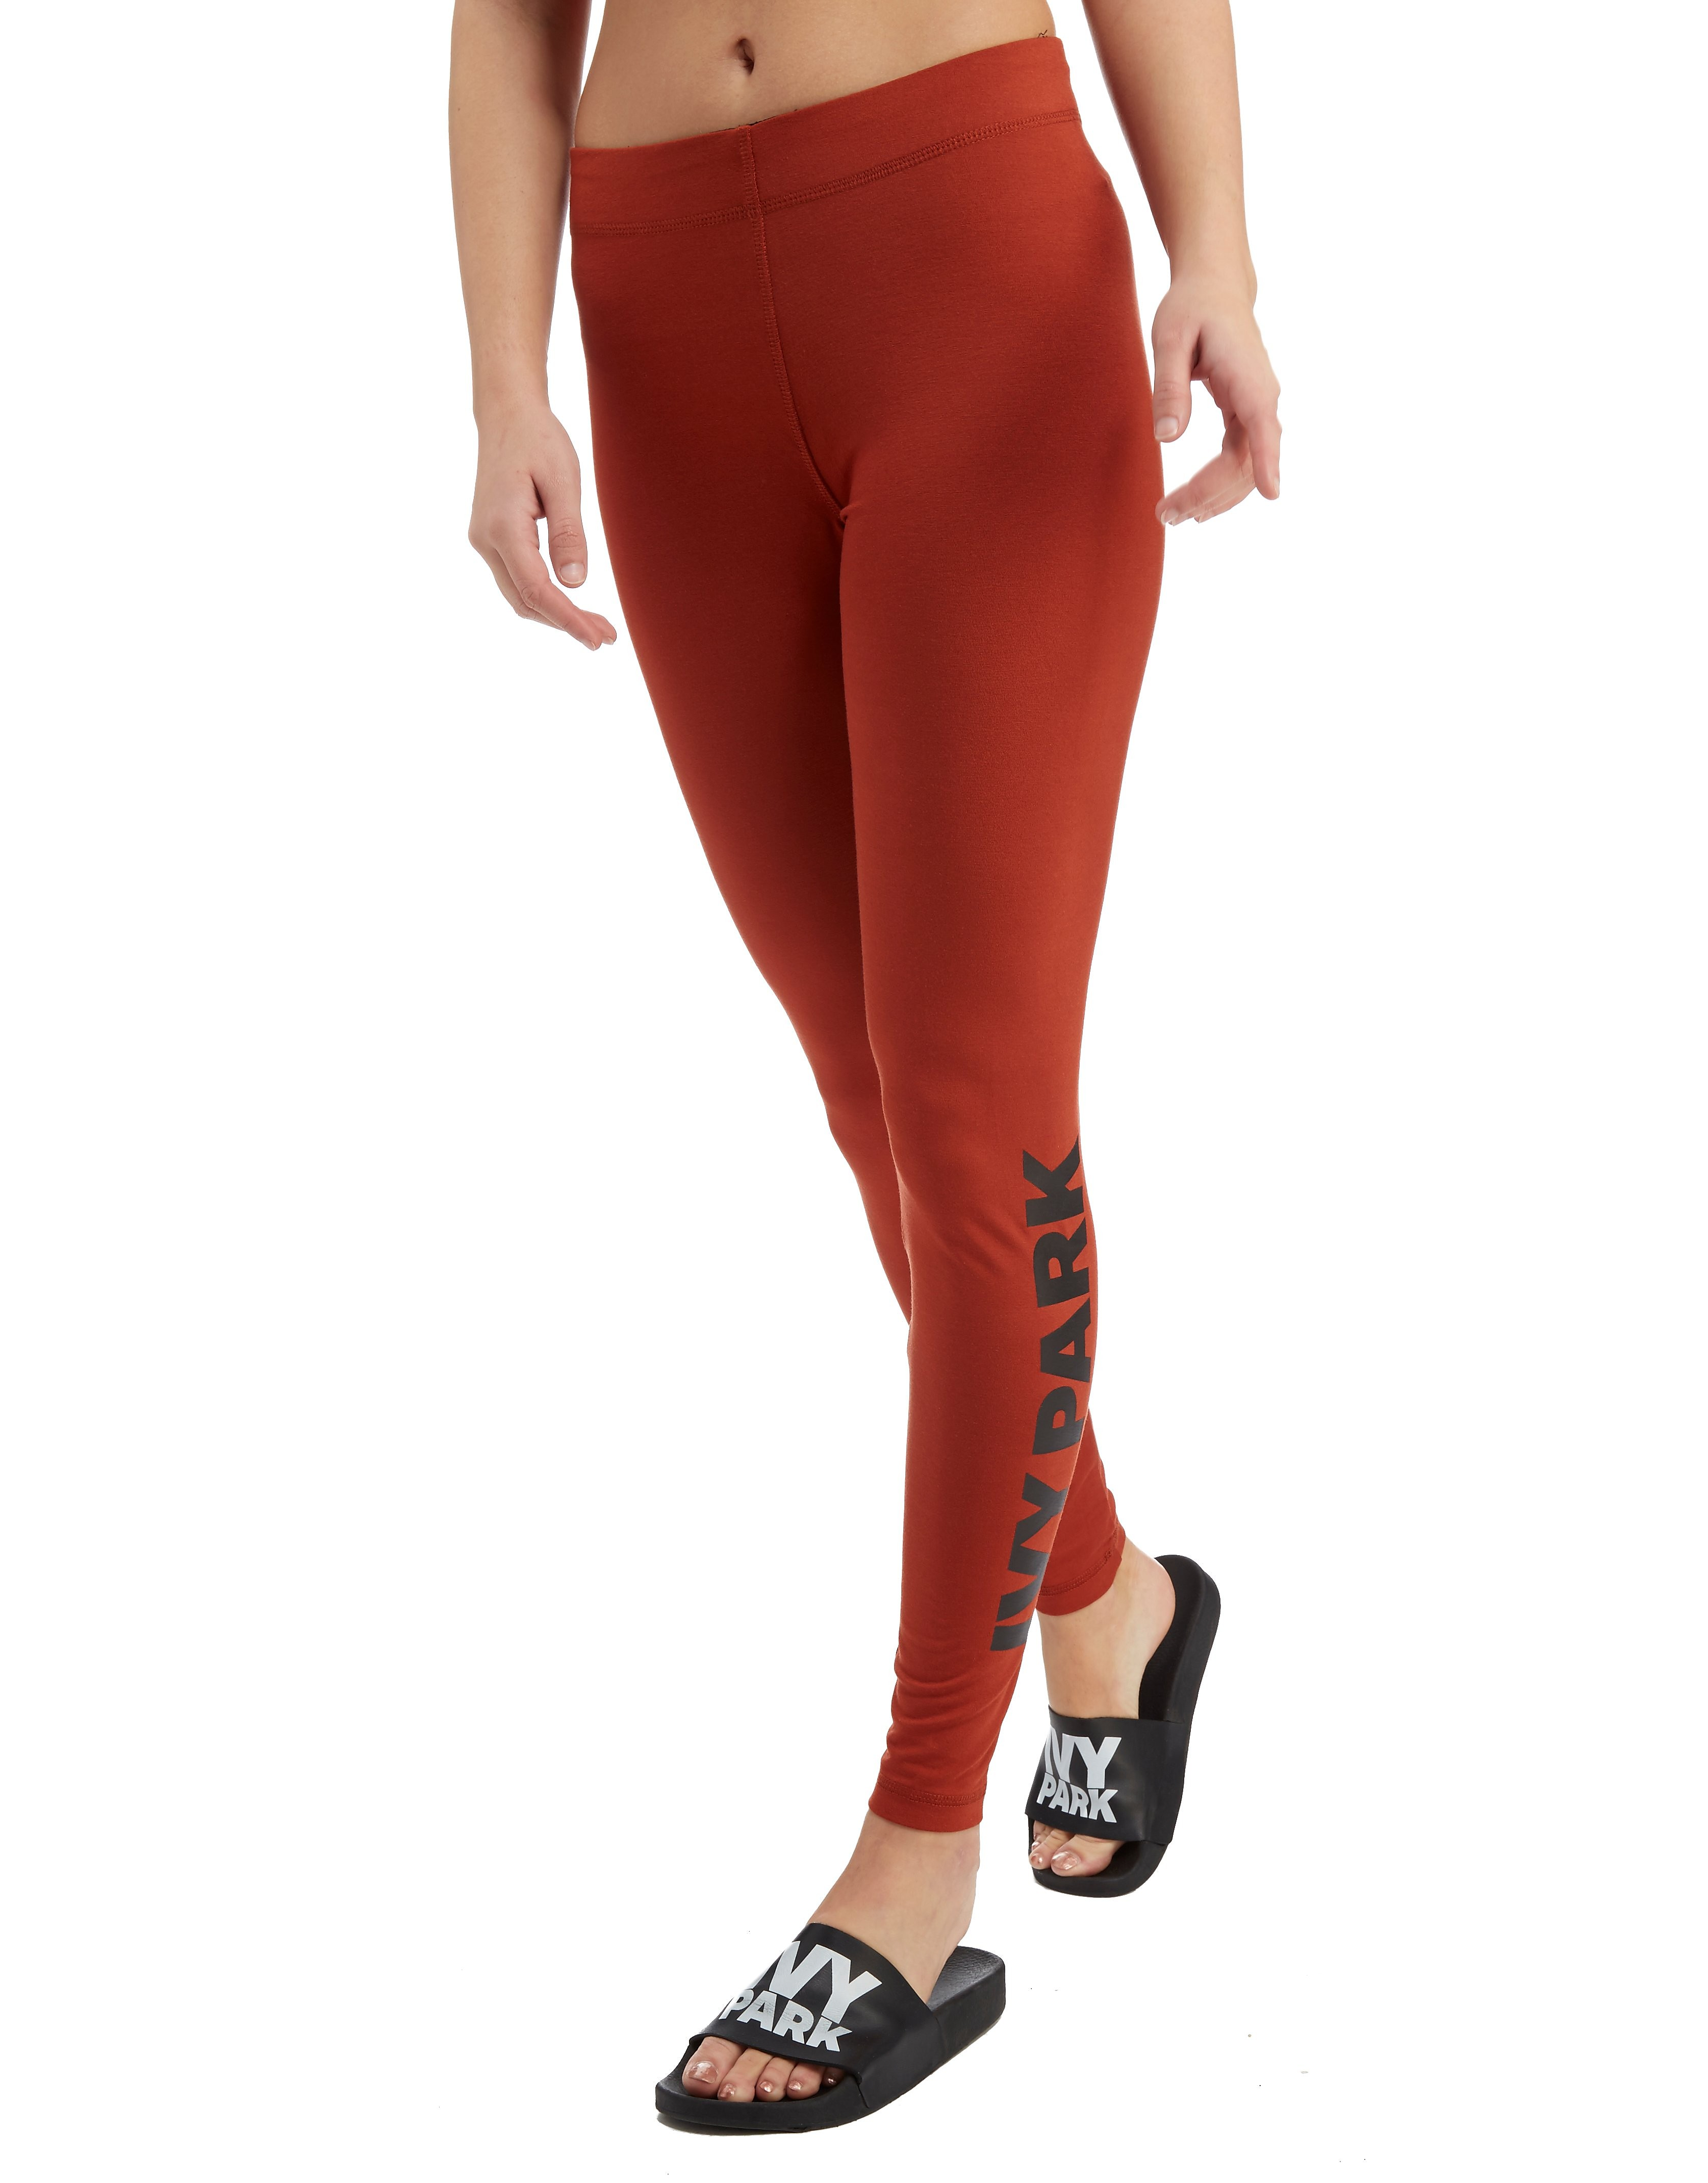 IVY PARK Leggings Logo Ankle Femme - maron, maron